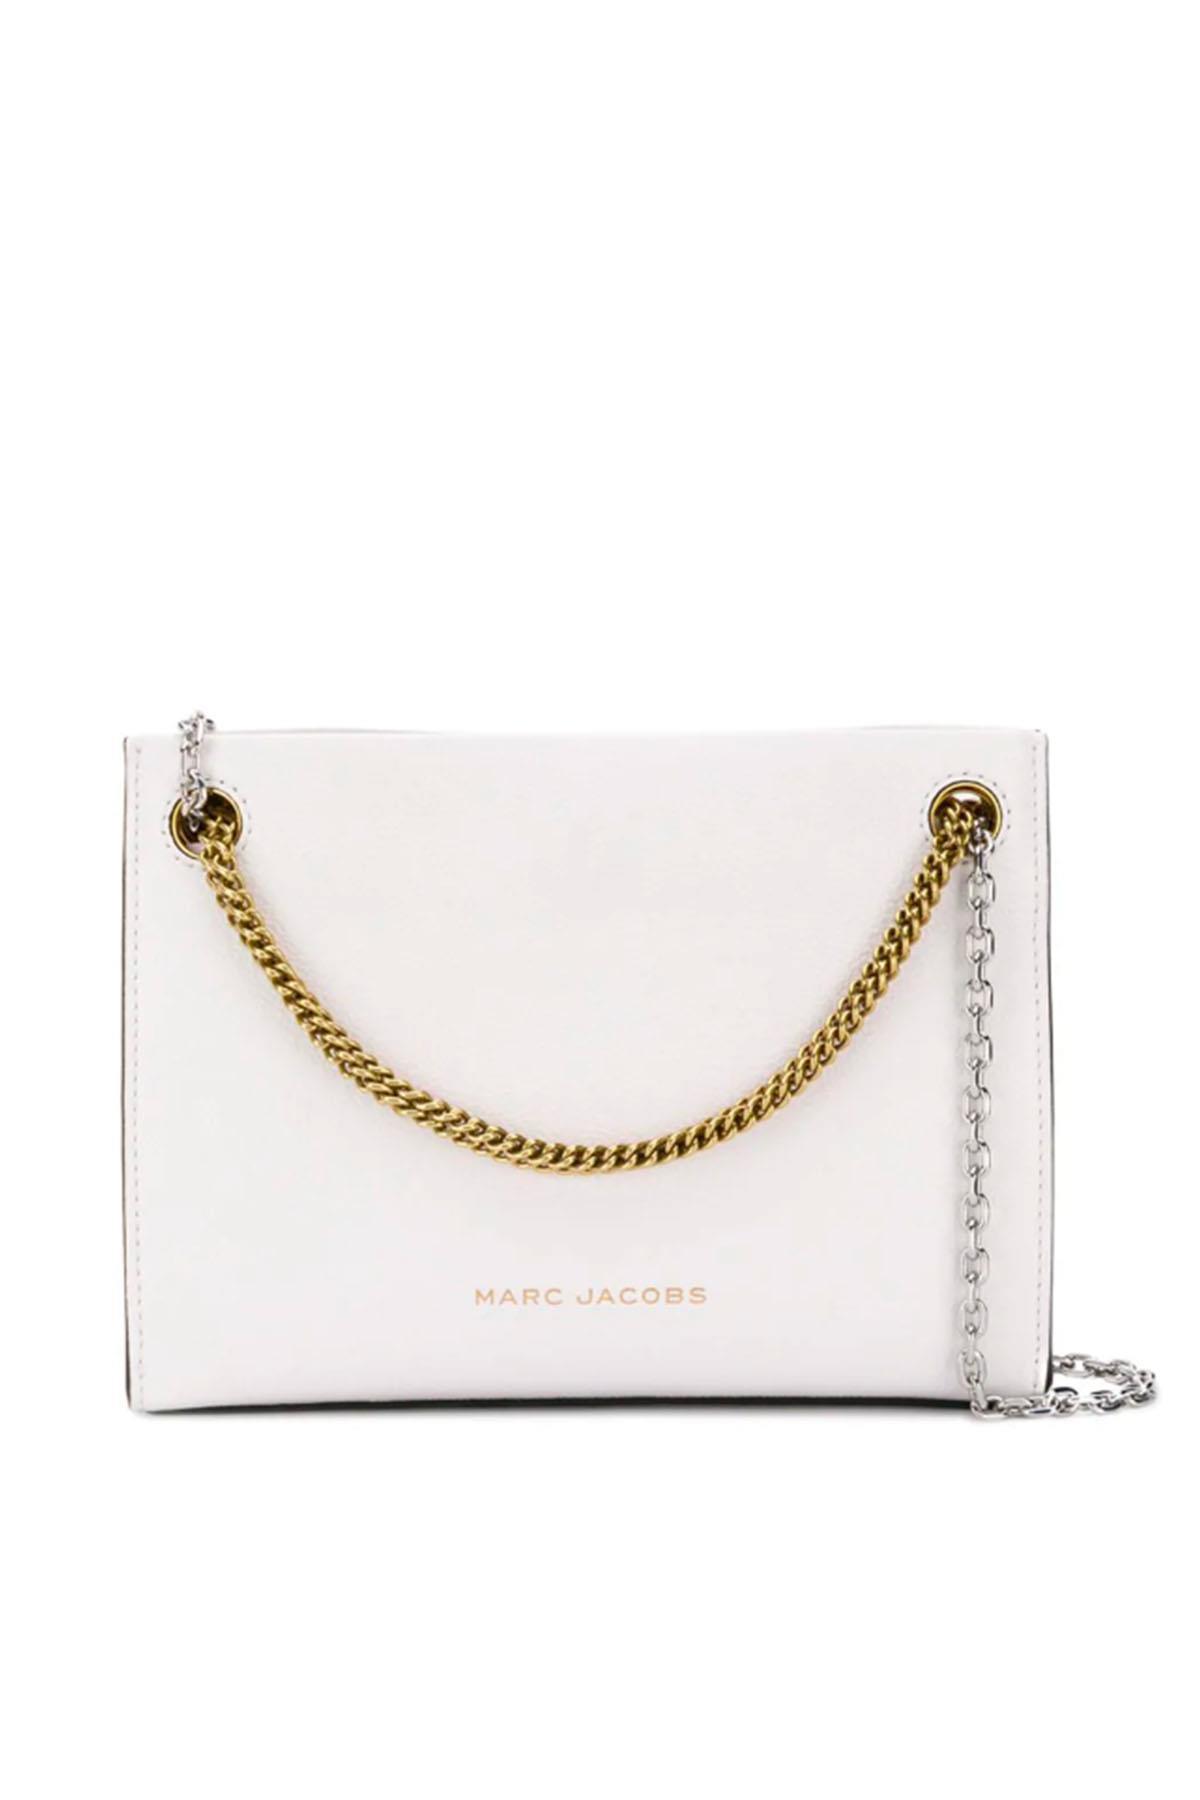 49fd9dfc9da Double Chain bag - MARC JACOBS - Giordano Boutique